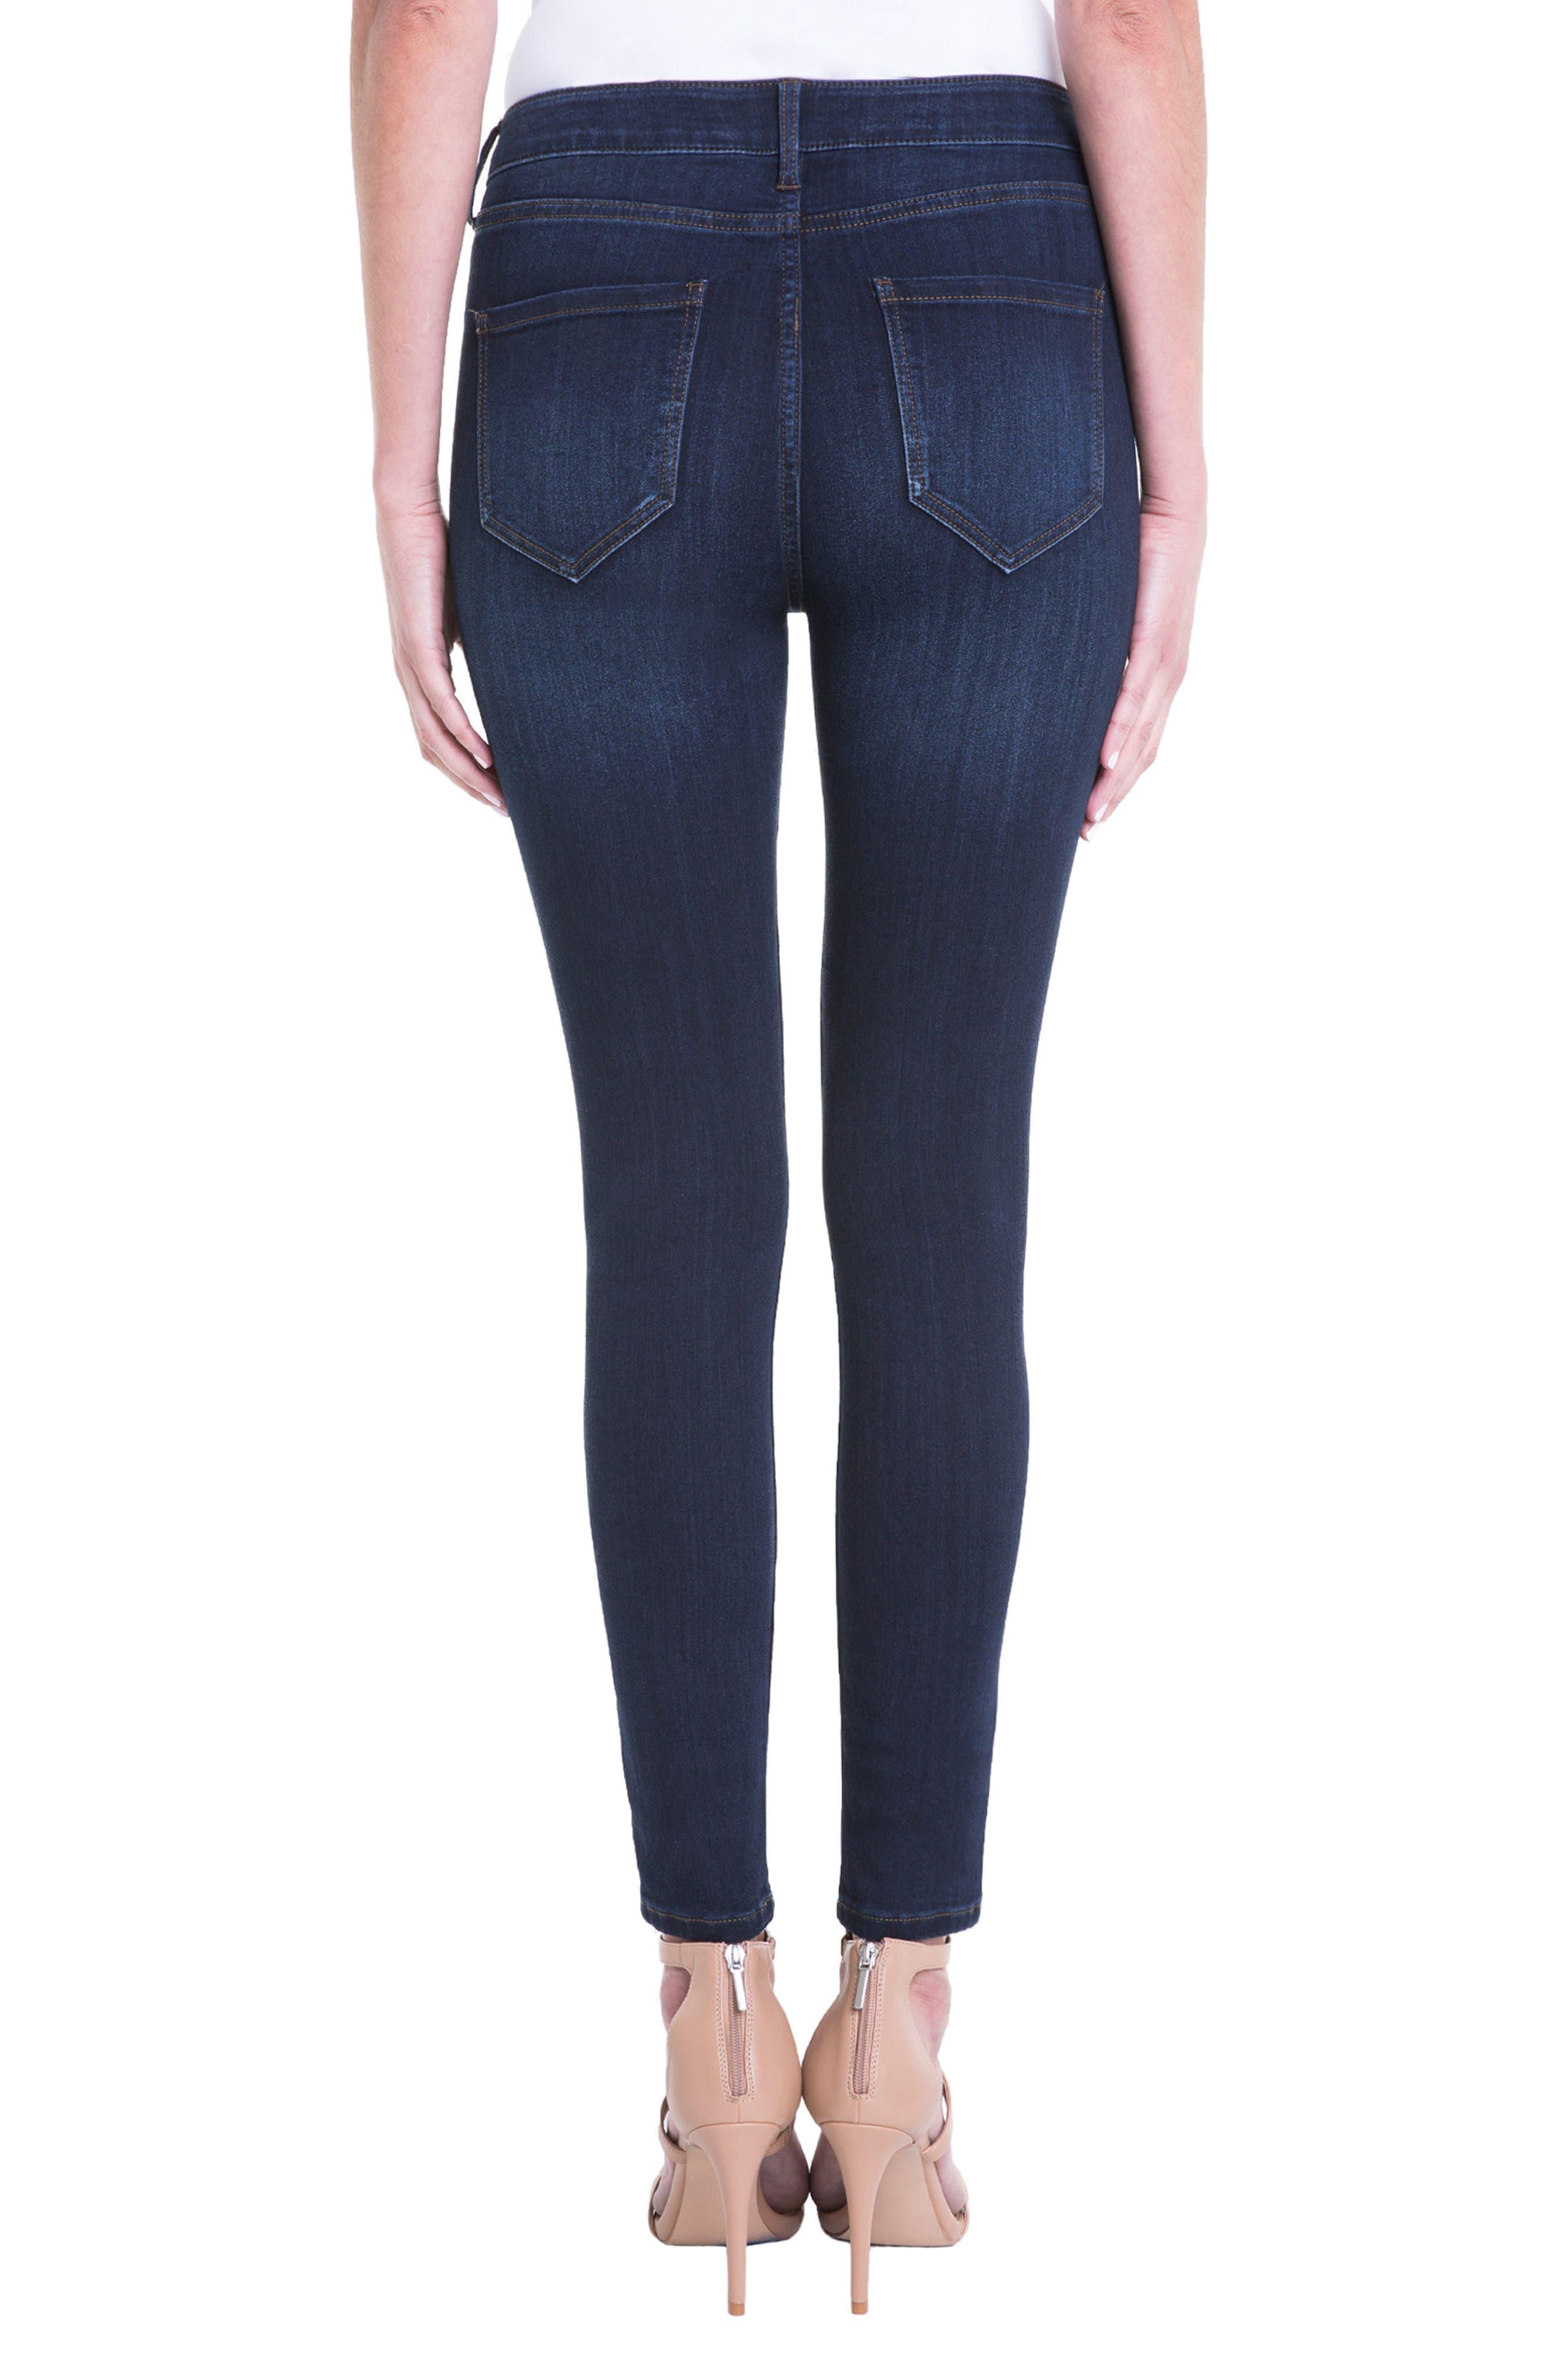 Jeans Company Bridget High Waist Skinny Jeans,                             Alternate thumbnail 2, color,                             Dunmore Dark